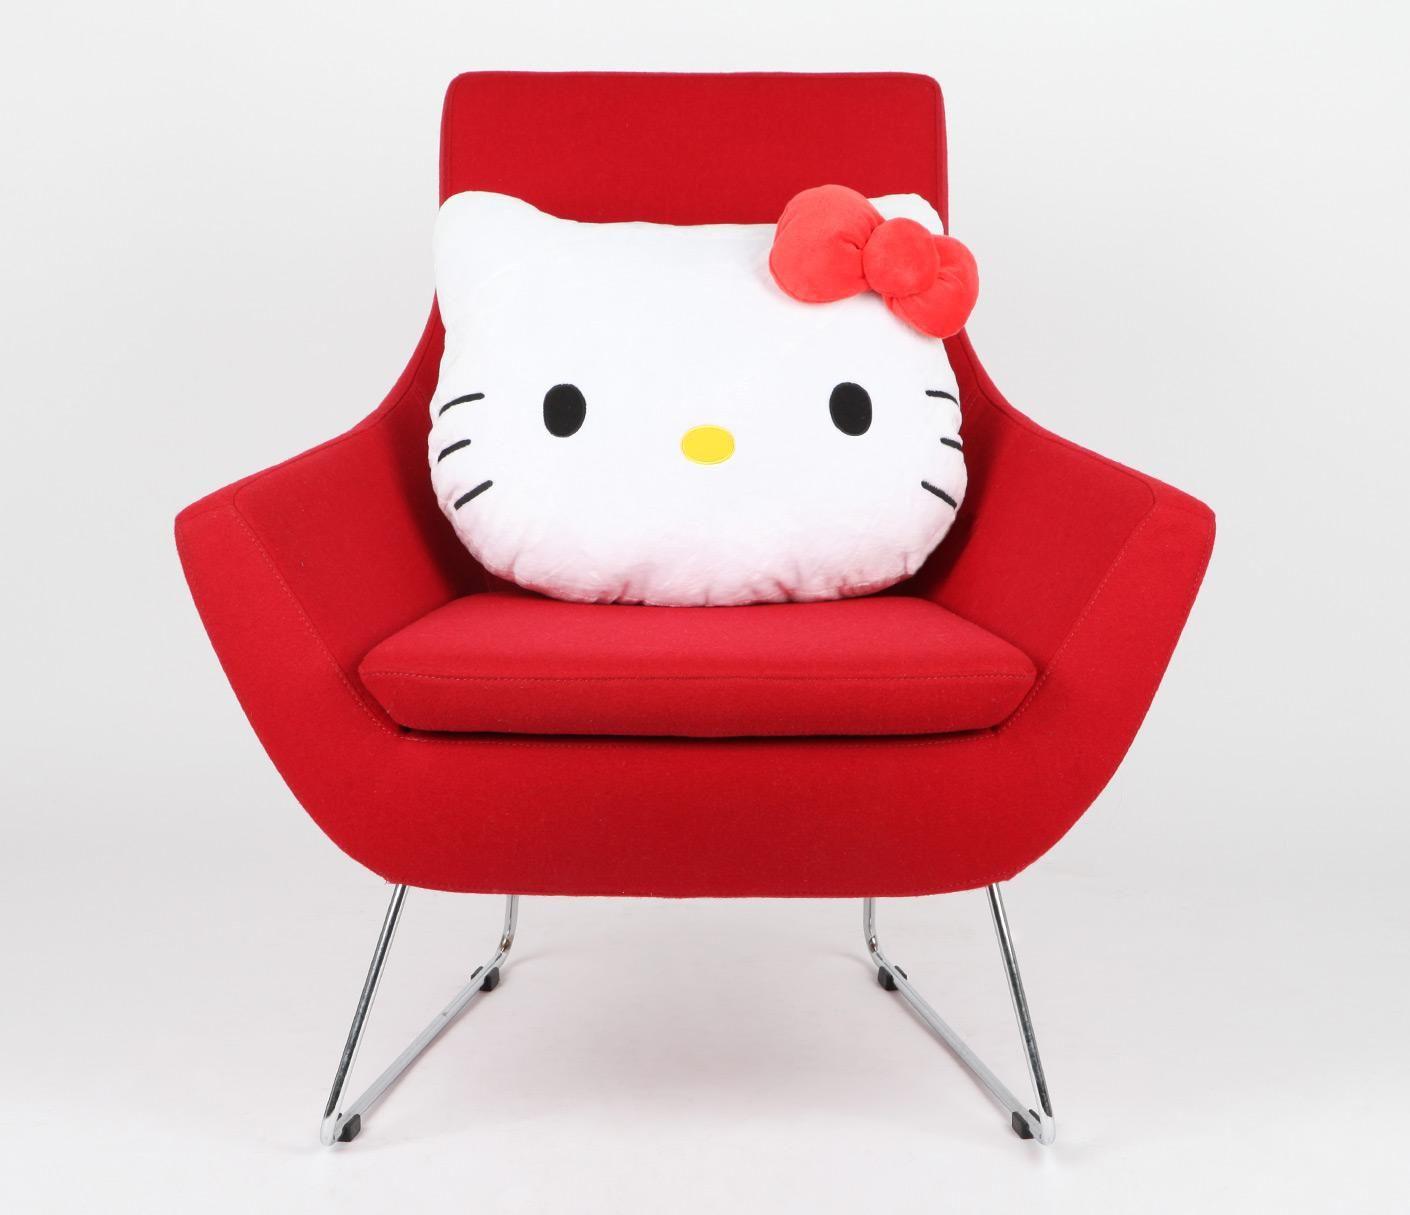 funinterior hellokitty character cushion allerlei pinterest kissen und n hen. Black Bedroom Furniture Sets. Home Design Ideas